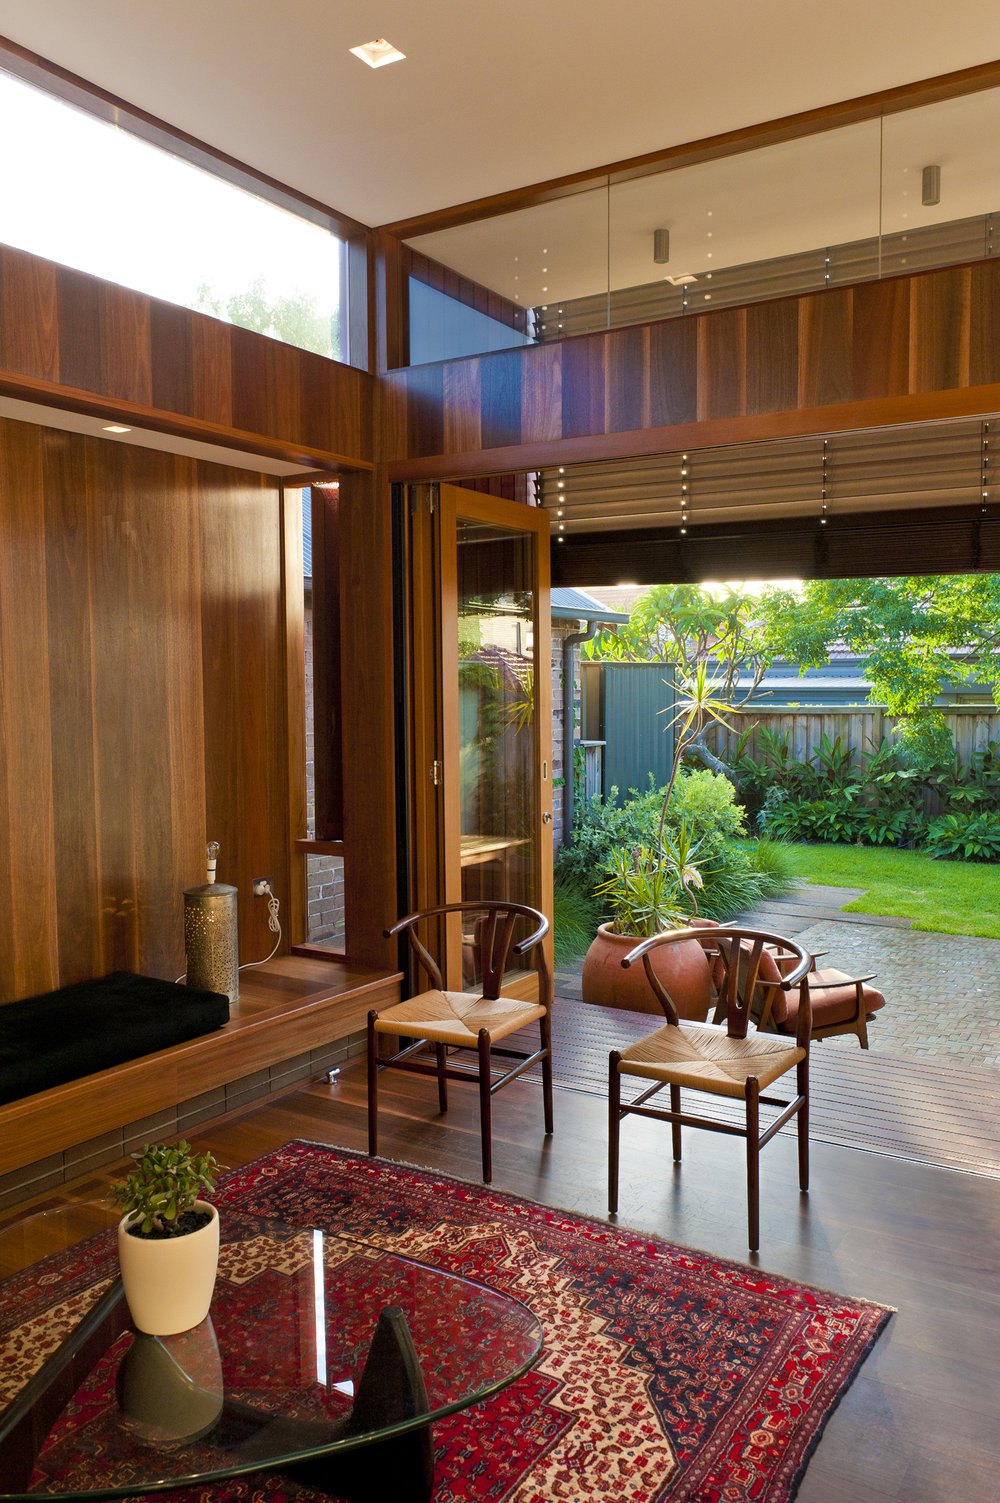 2011027154-07-KensingtonHouse-JohnSlaytor.jpg